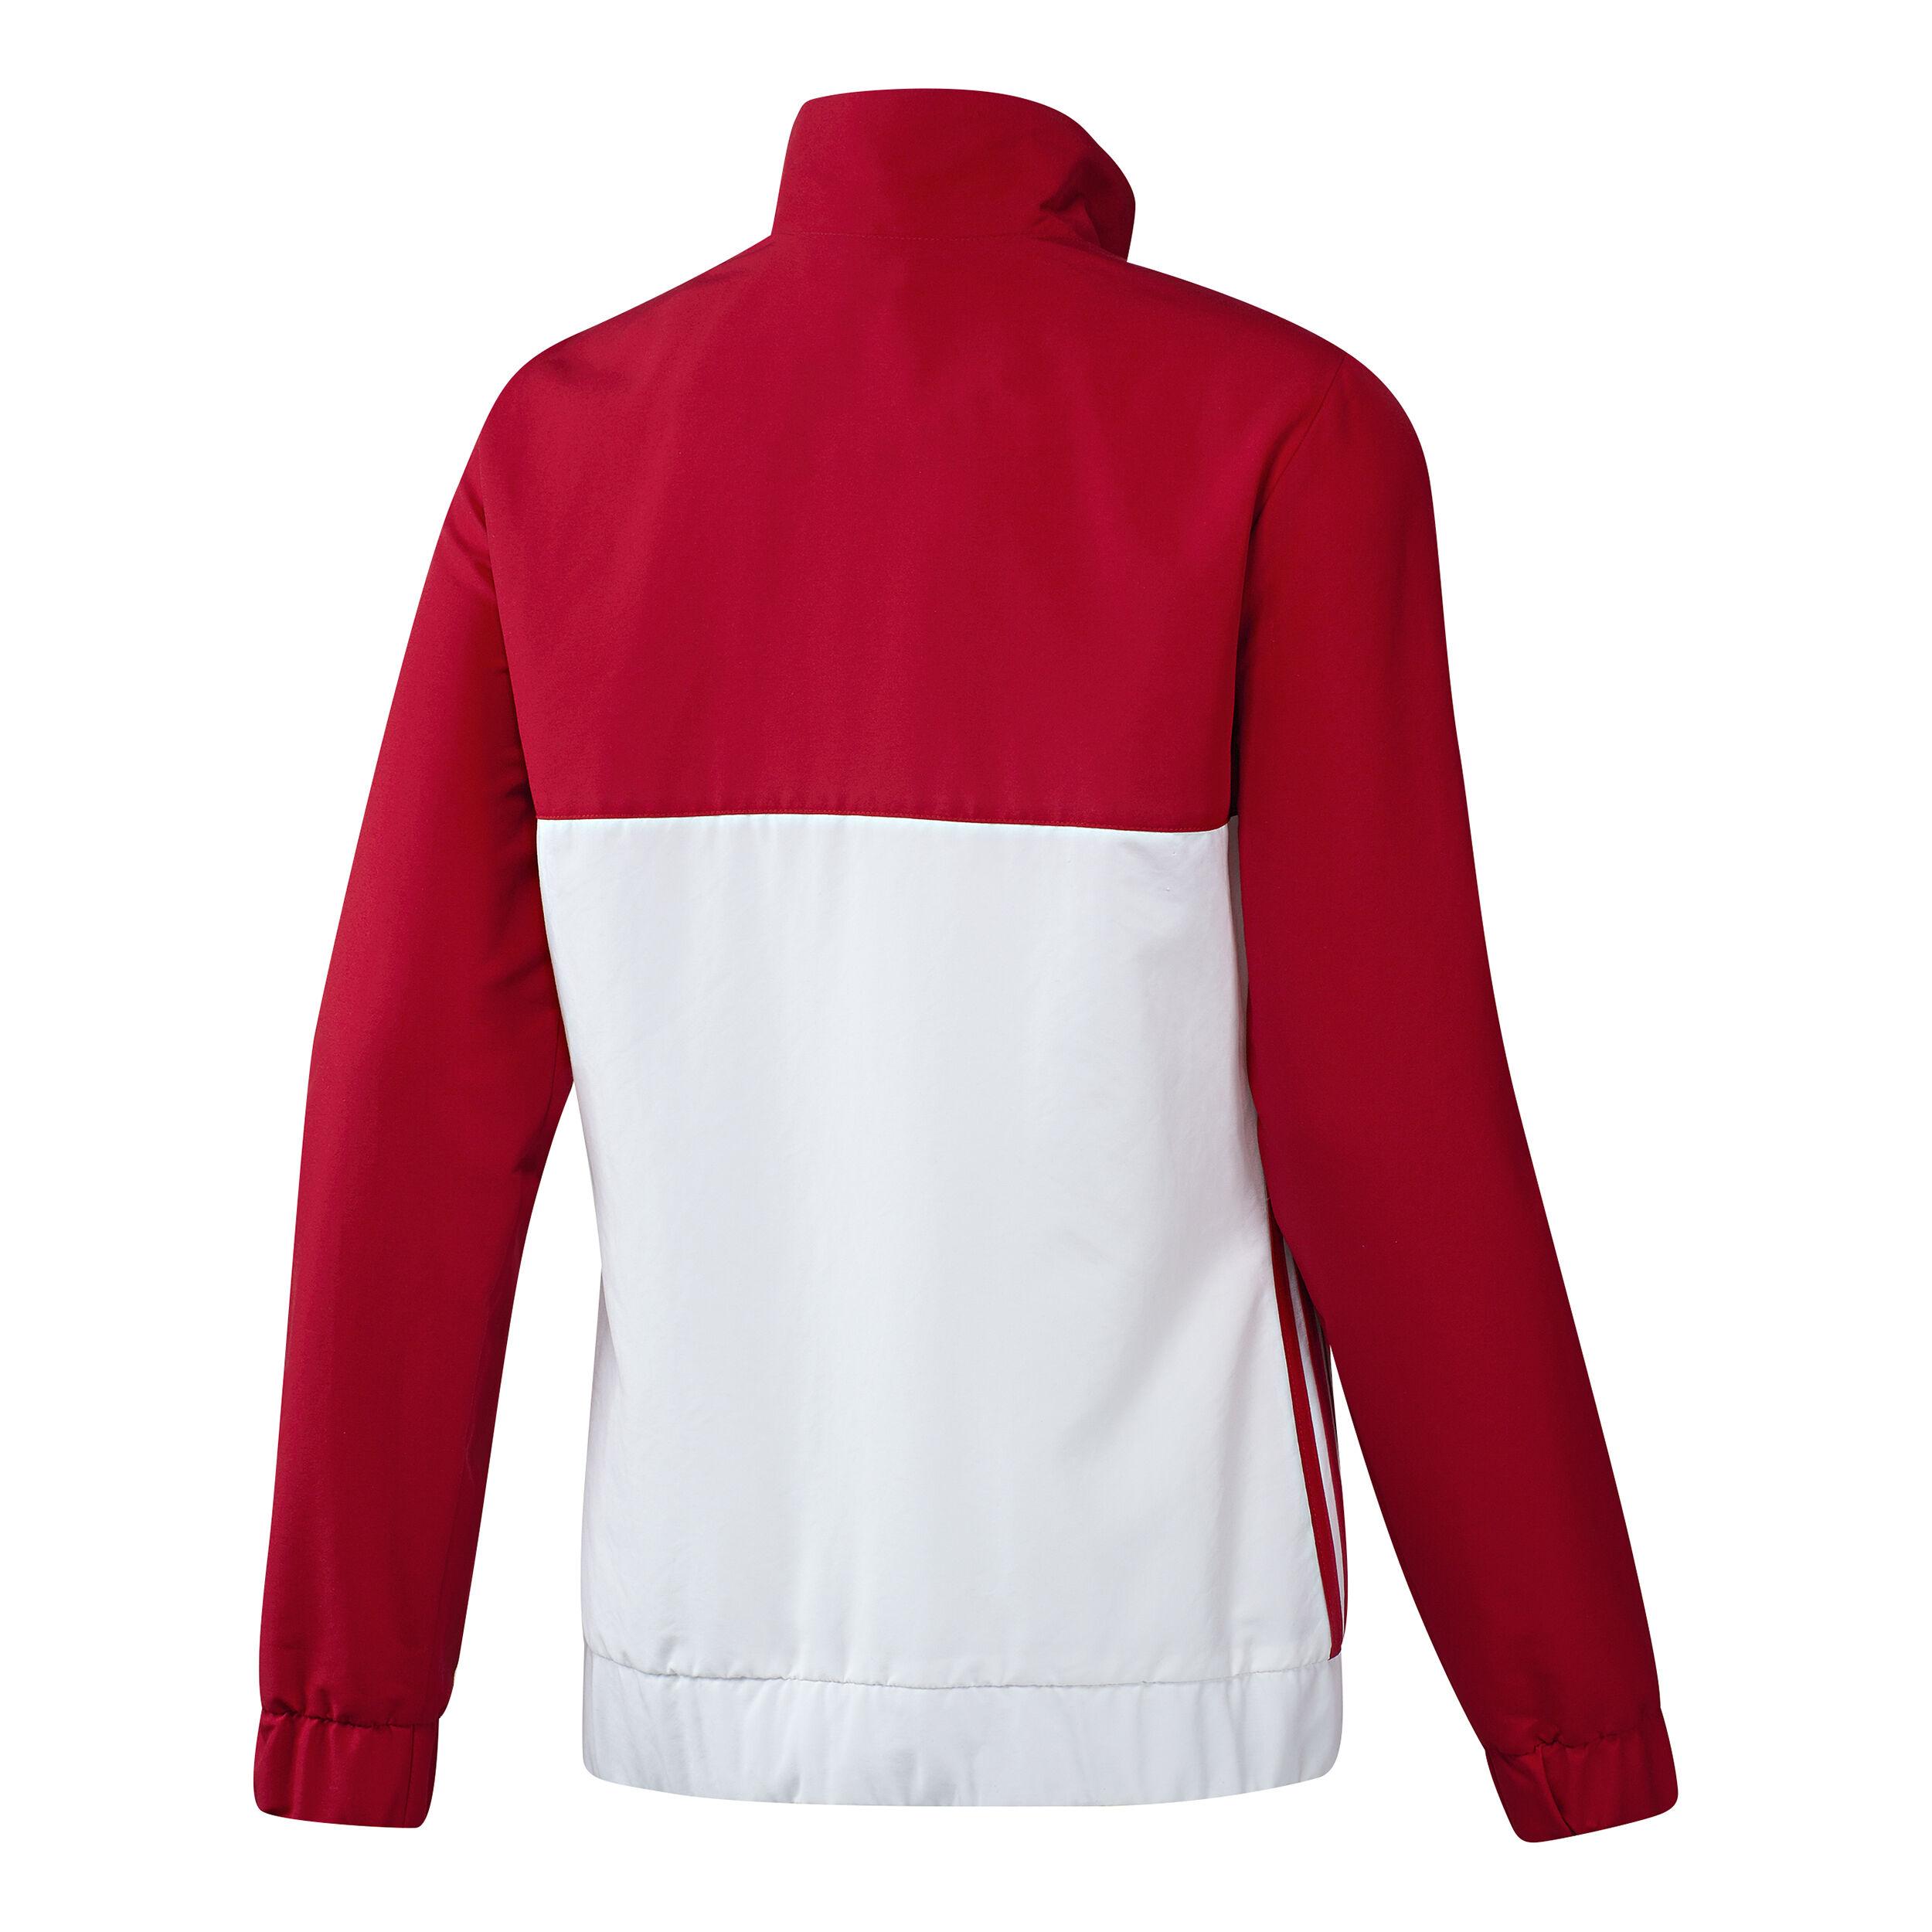 adidas T16 Team Jacket Trainingsjacke Damen Rot, Weiß